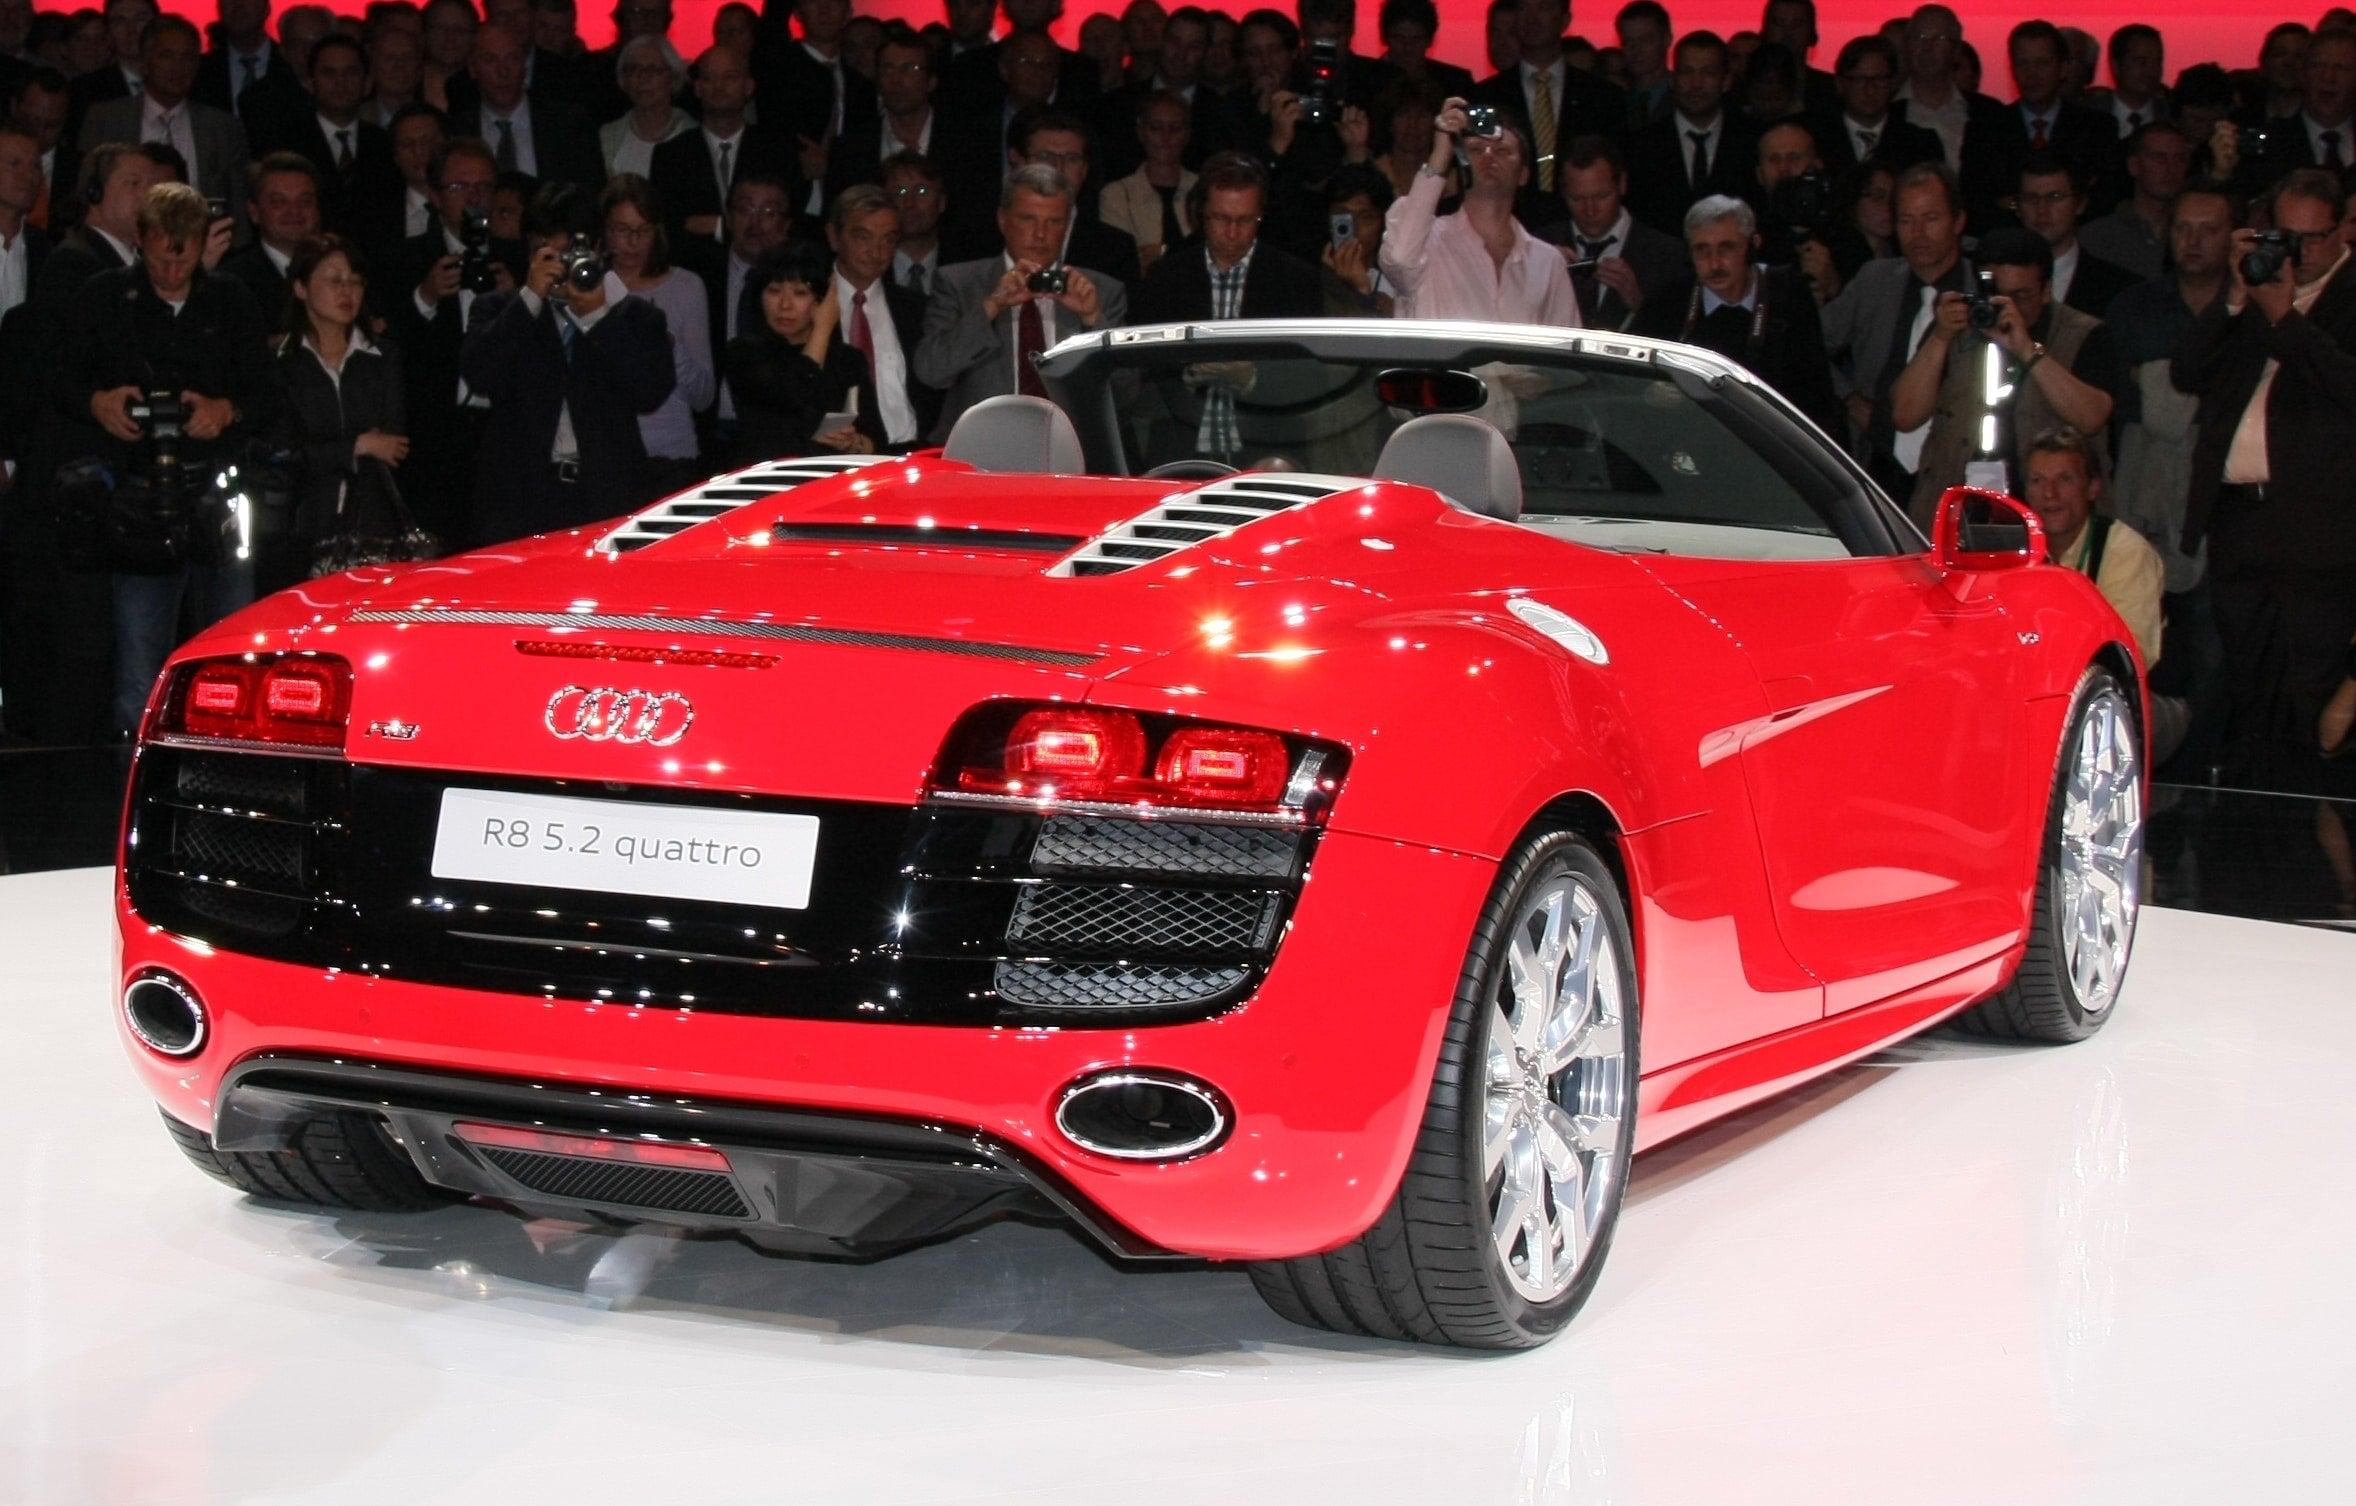 First Look: 2010 Audi R8 5.2 Spider | TheDetroitBureau.com